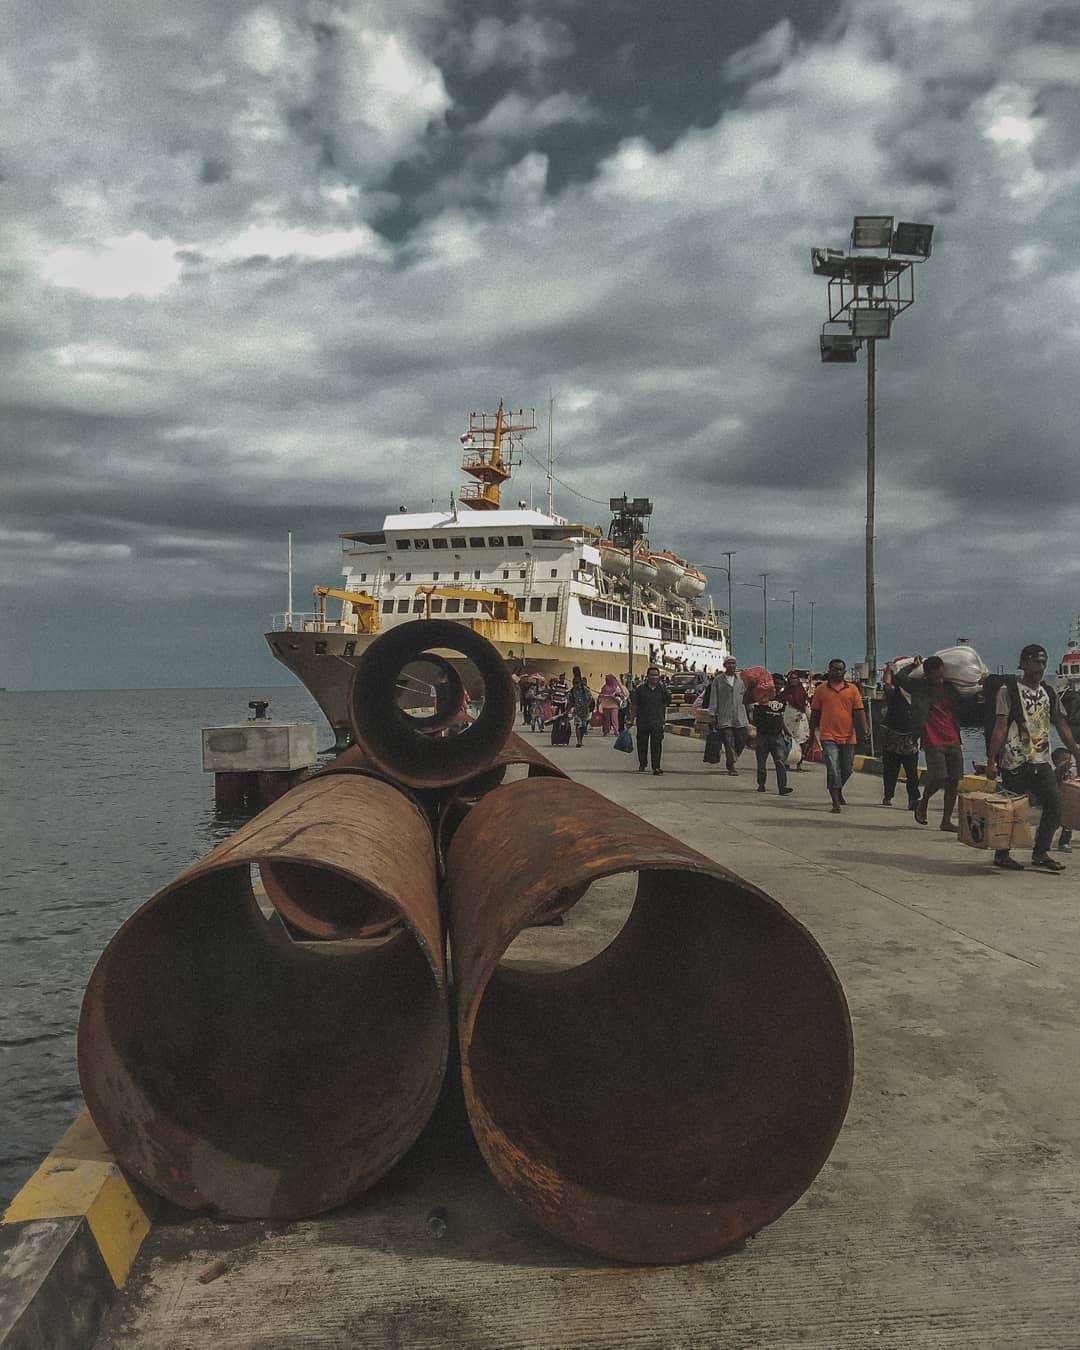 Berlibur ke Bali Ataupun Sumbawa Dengan Nyaman Pakai KM Awu 1